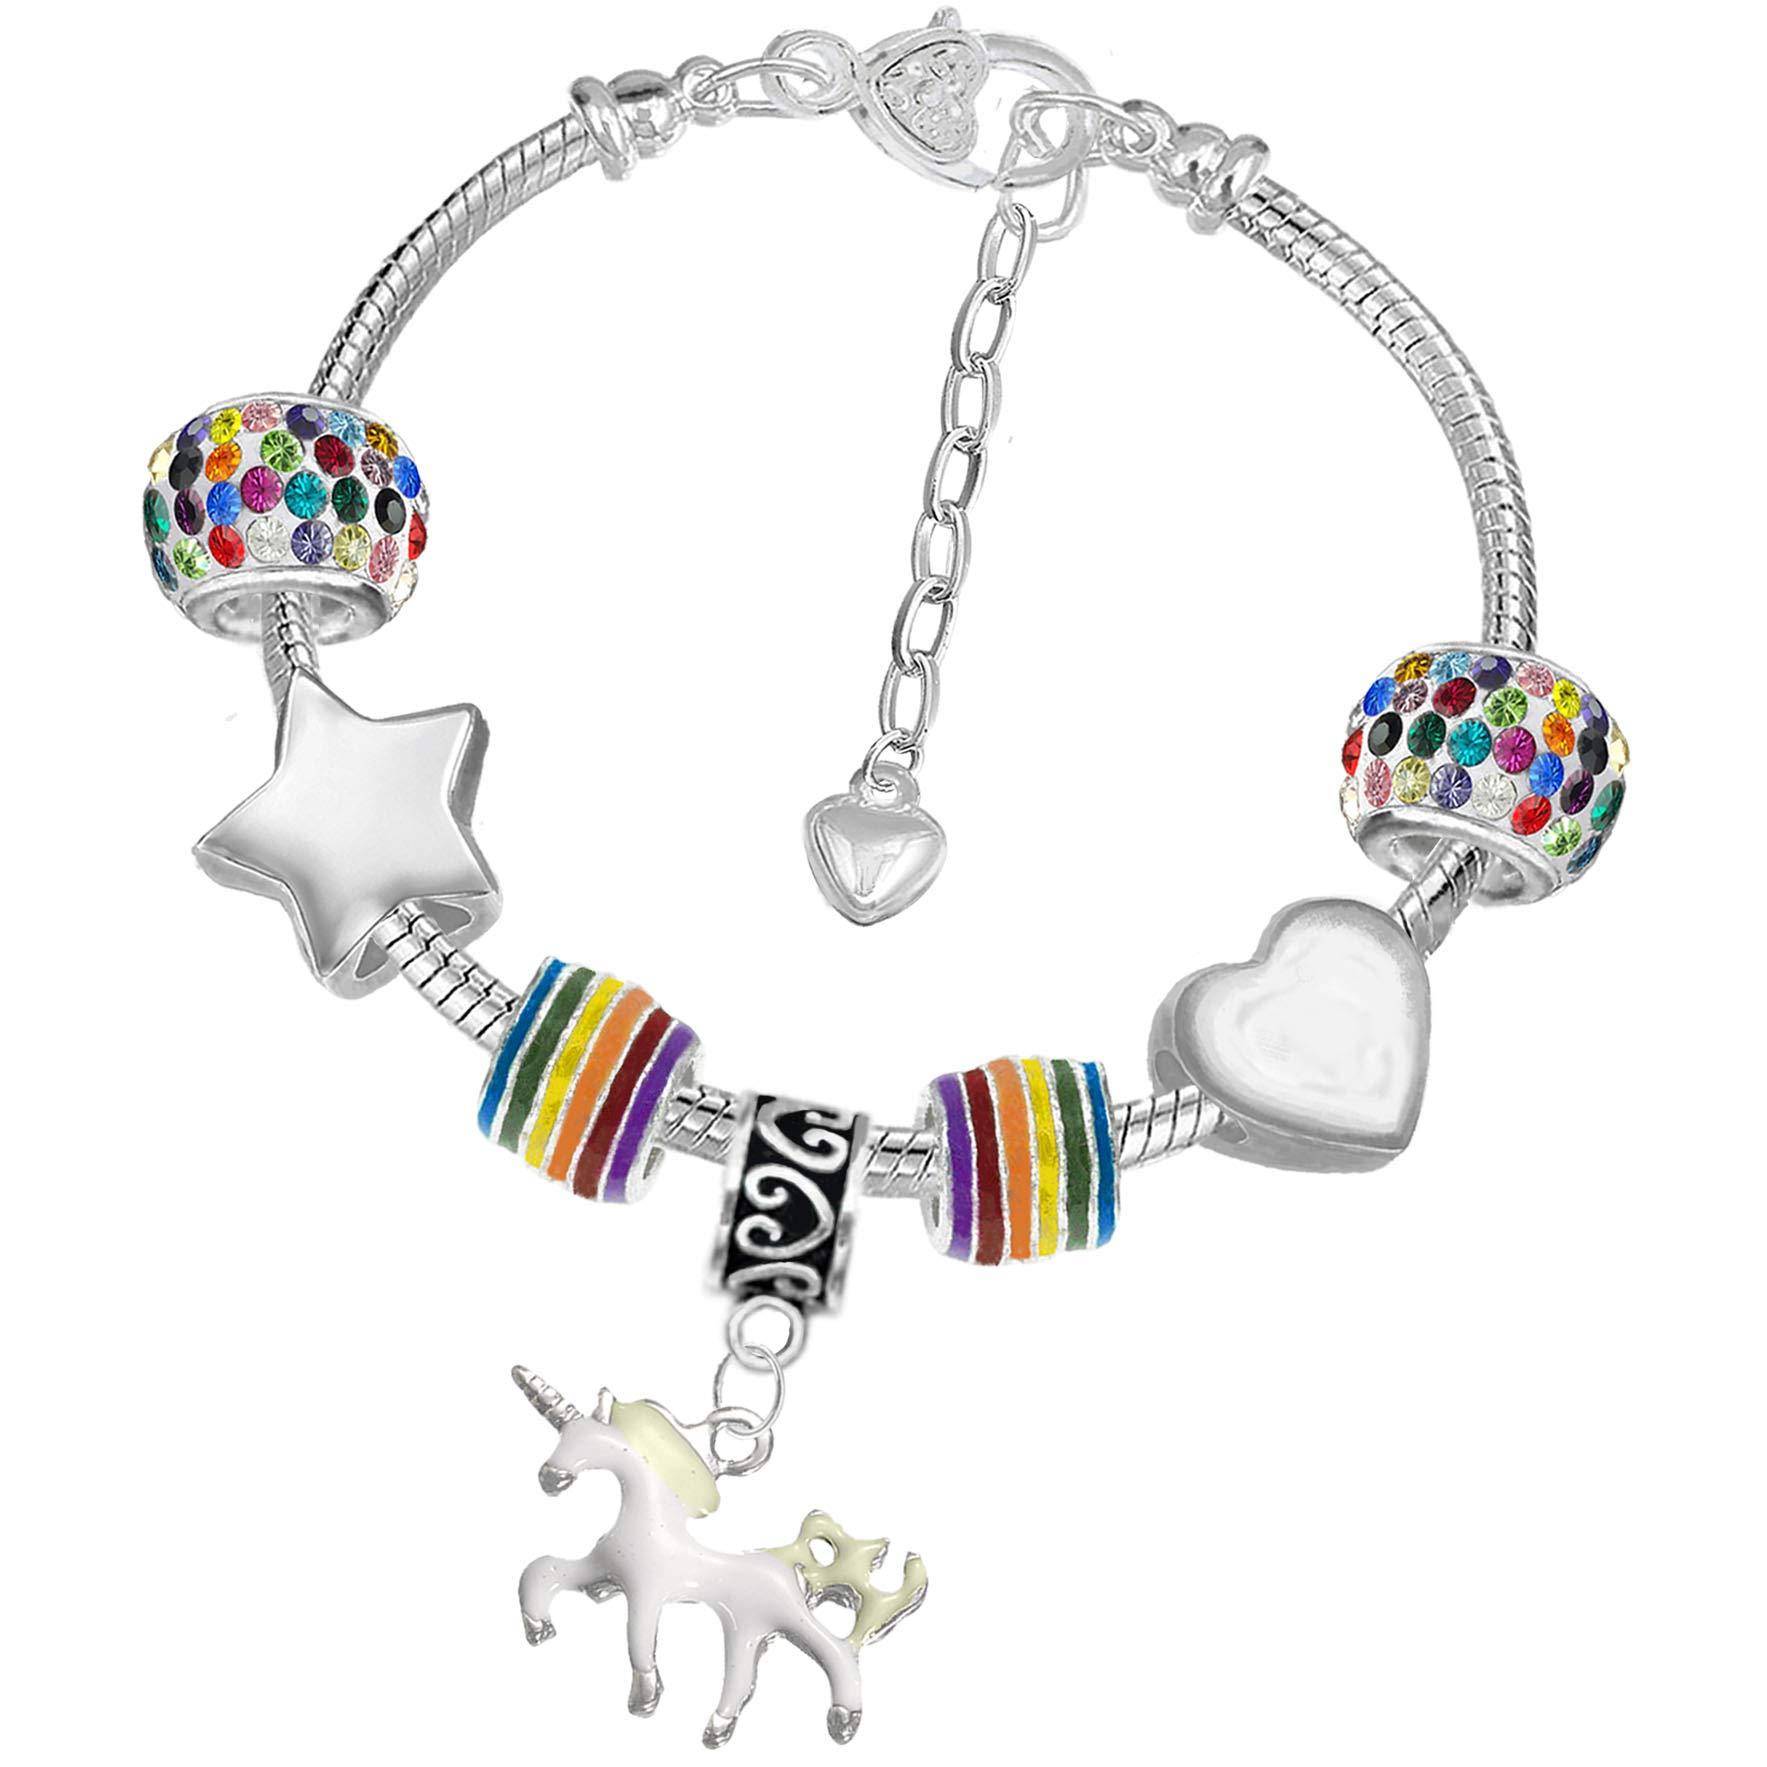 Girls Magical Unicorn Braided Leather Birthday Charm Bracelet with Gift Box